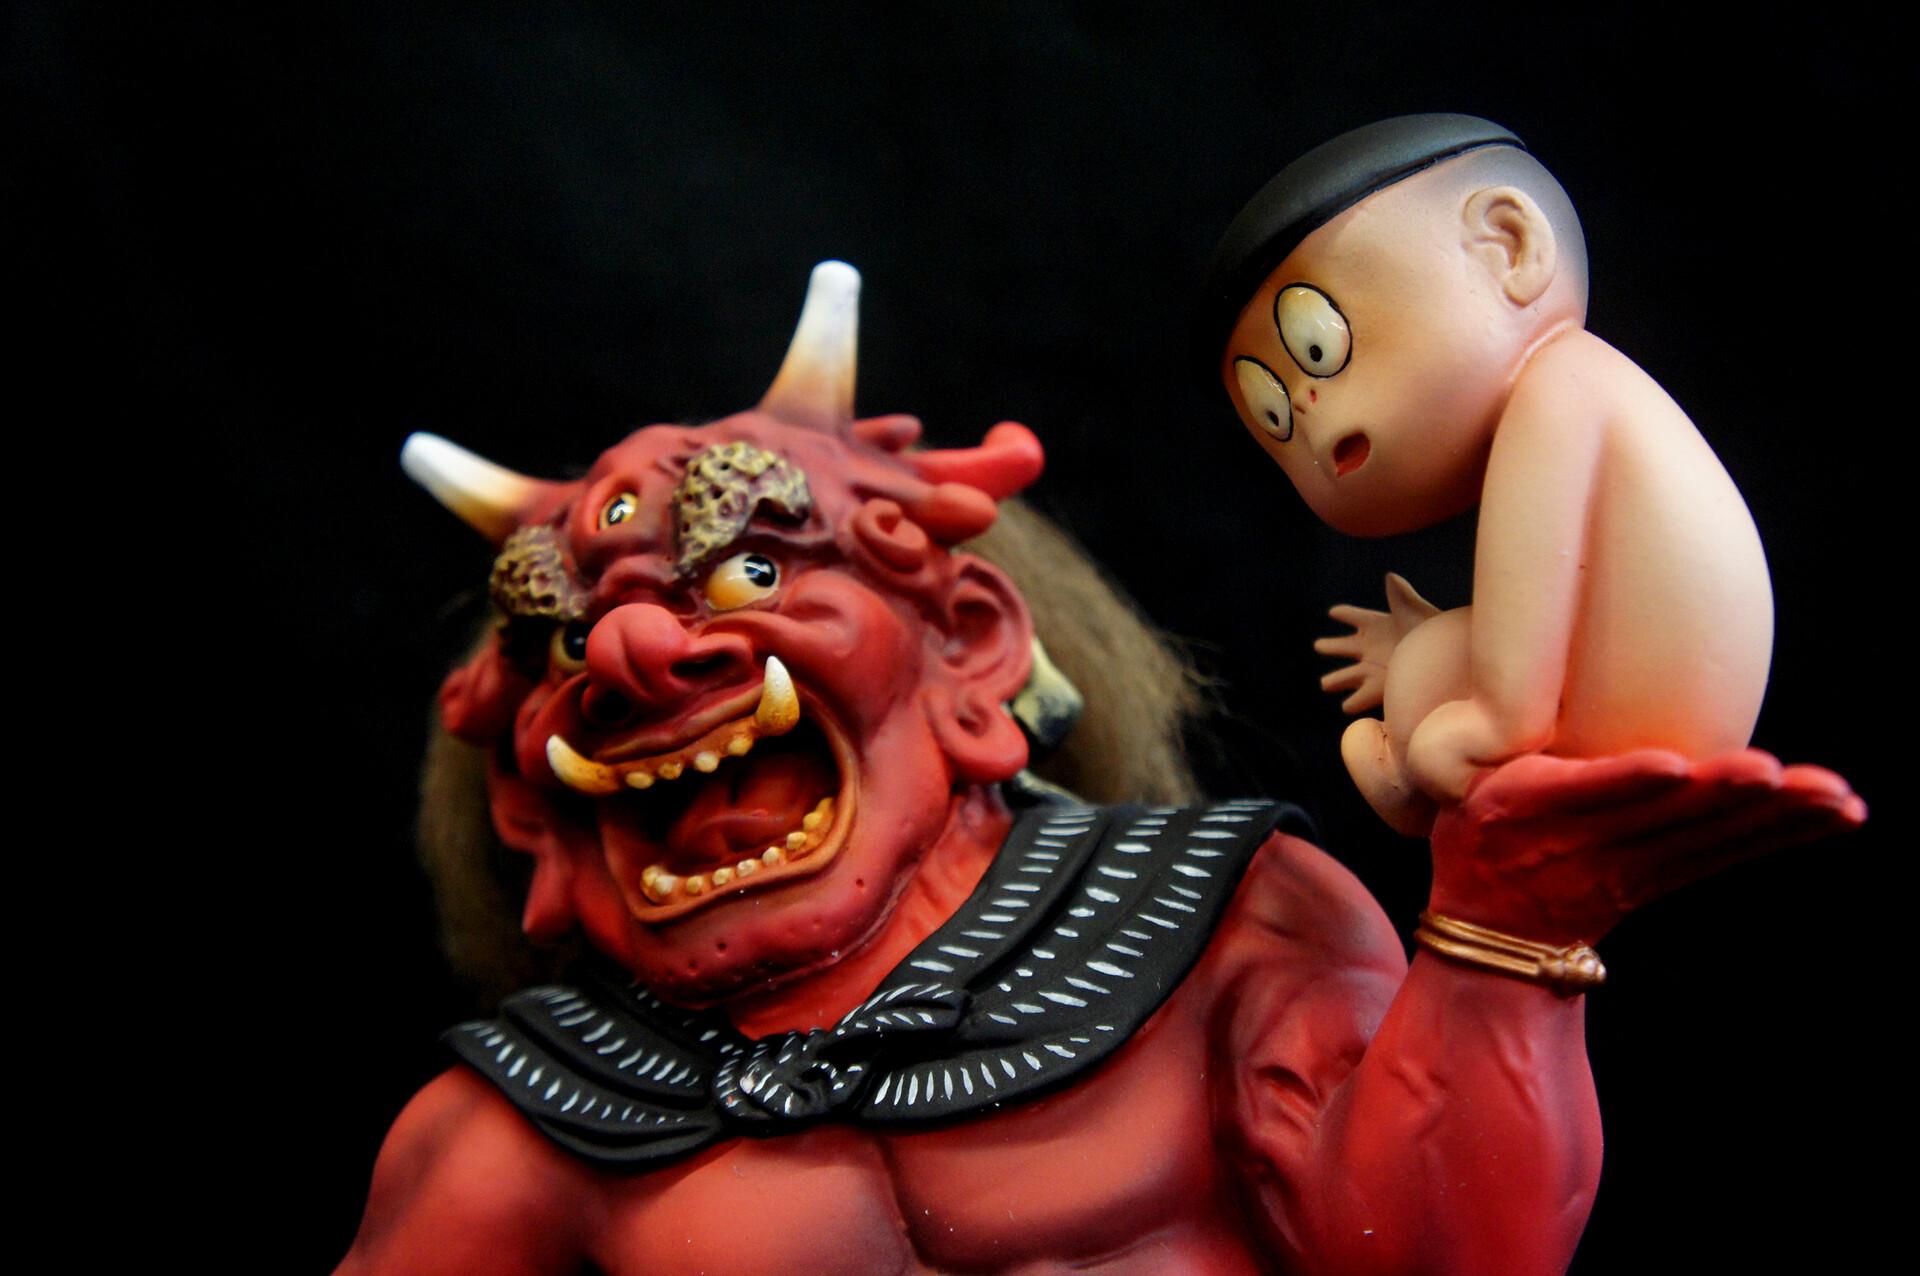 Hell Of GeGeGe No Kitaro Art Statue 鬼太郎 外伝 地獄